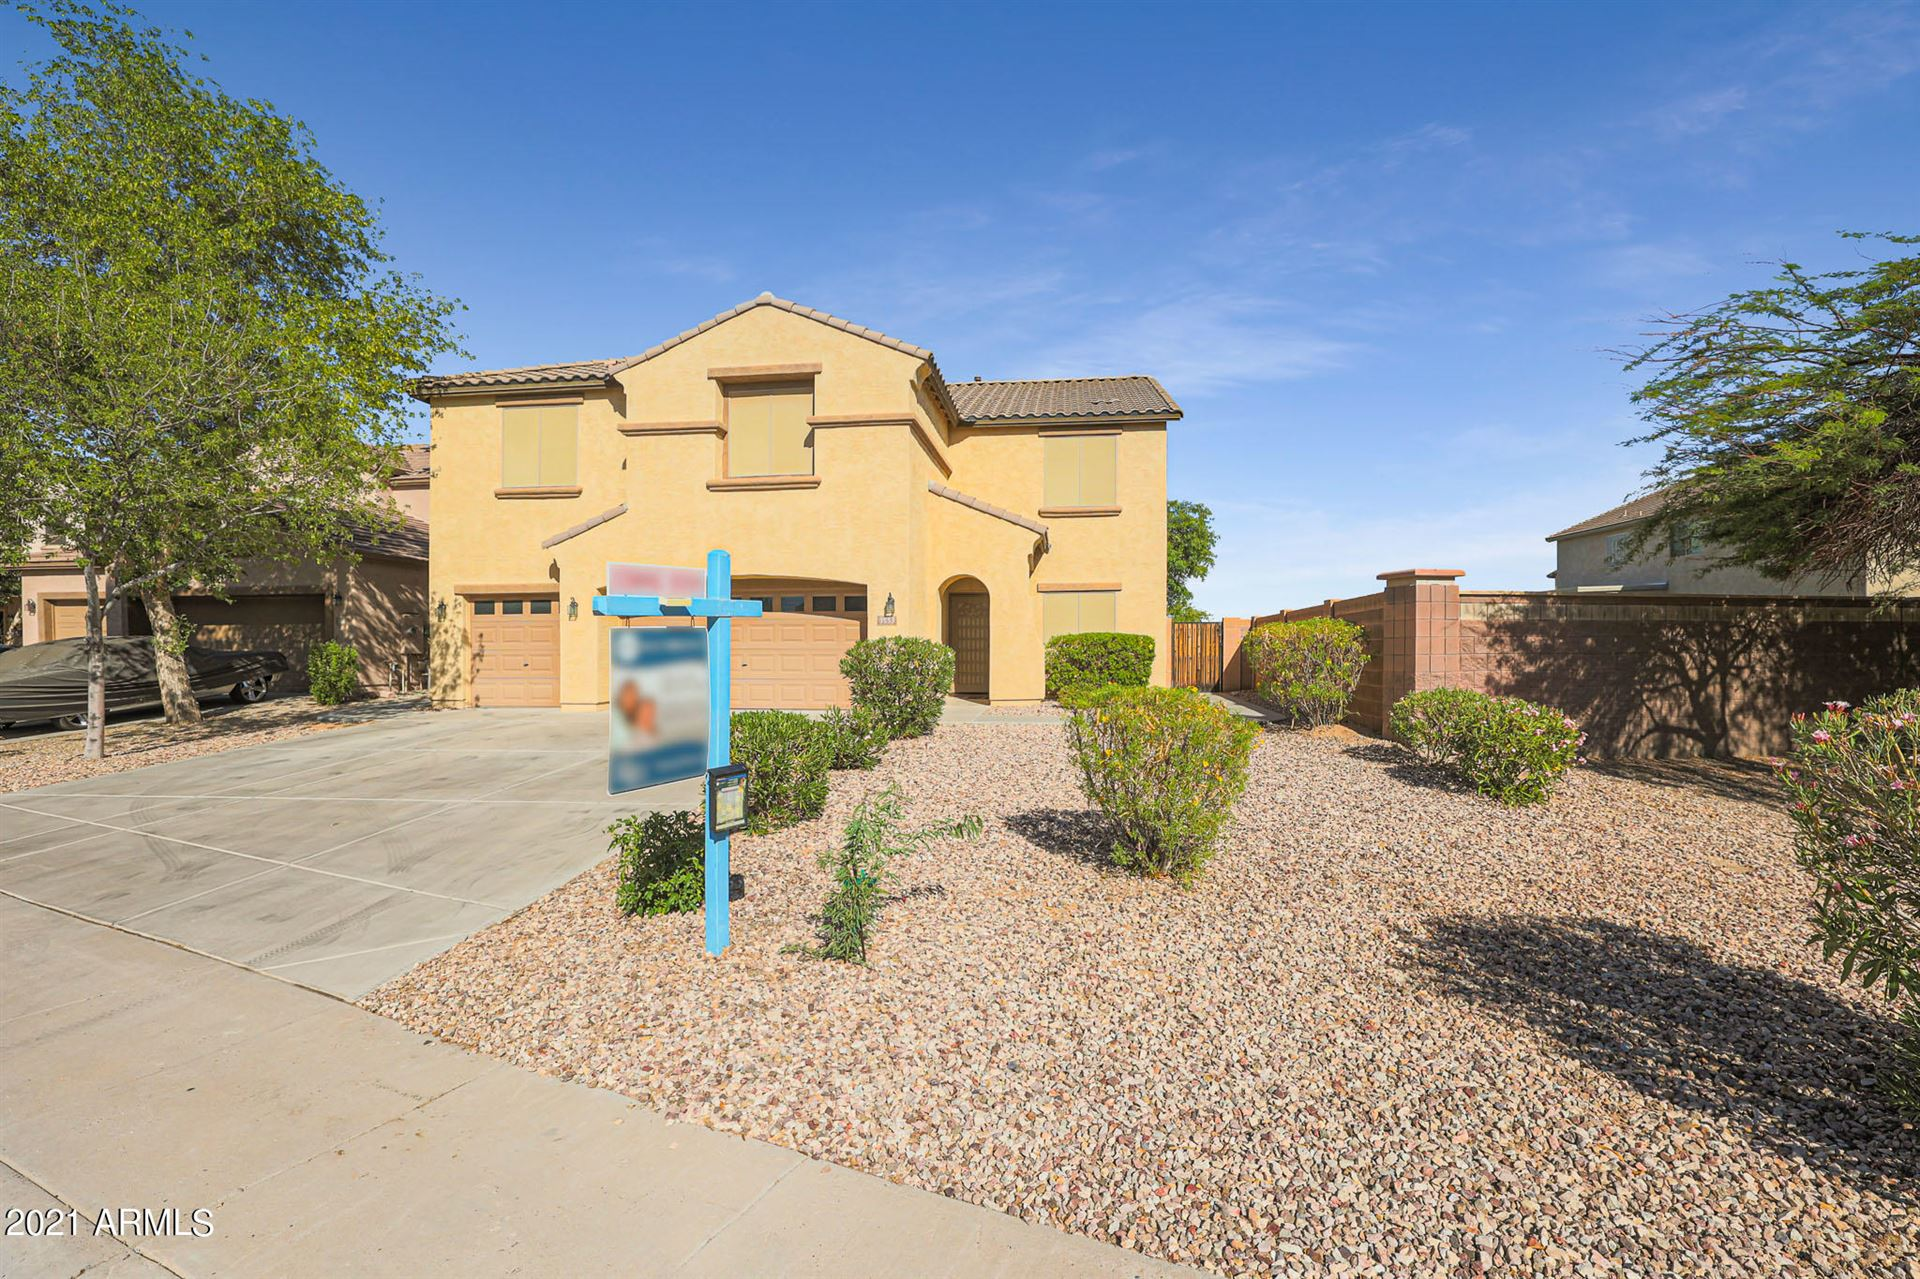 Photo of 3553 N 301ST Lane, Buckeye, AZ 85396 (MLS # 6249904)